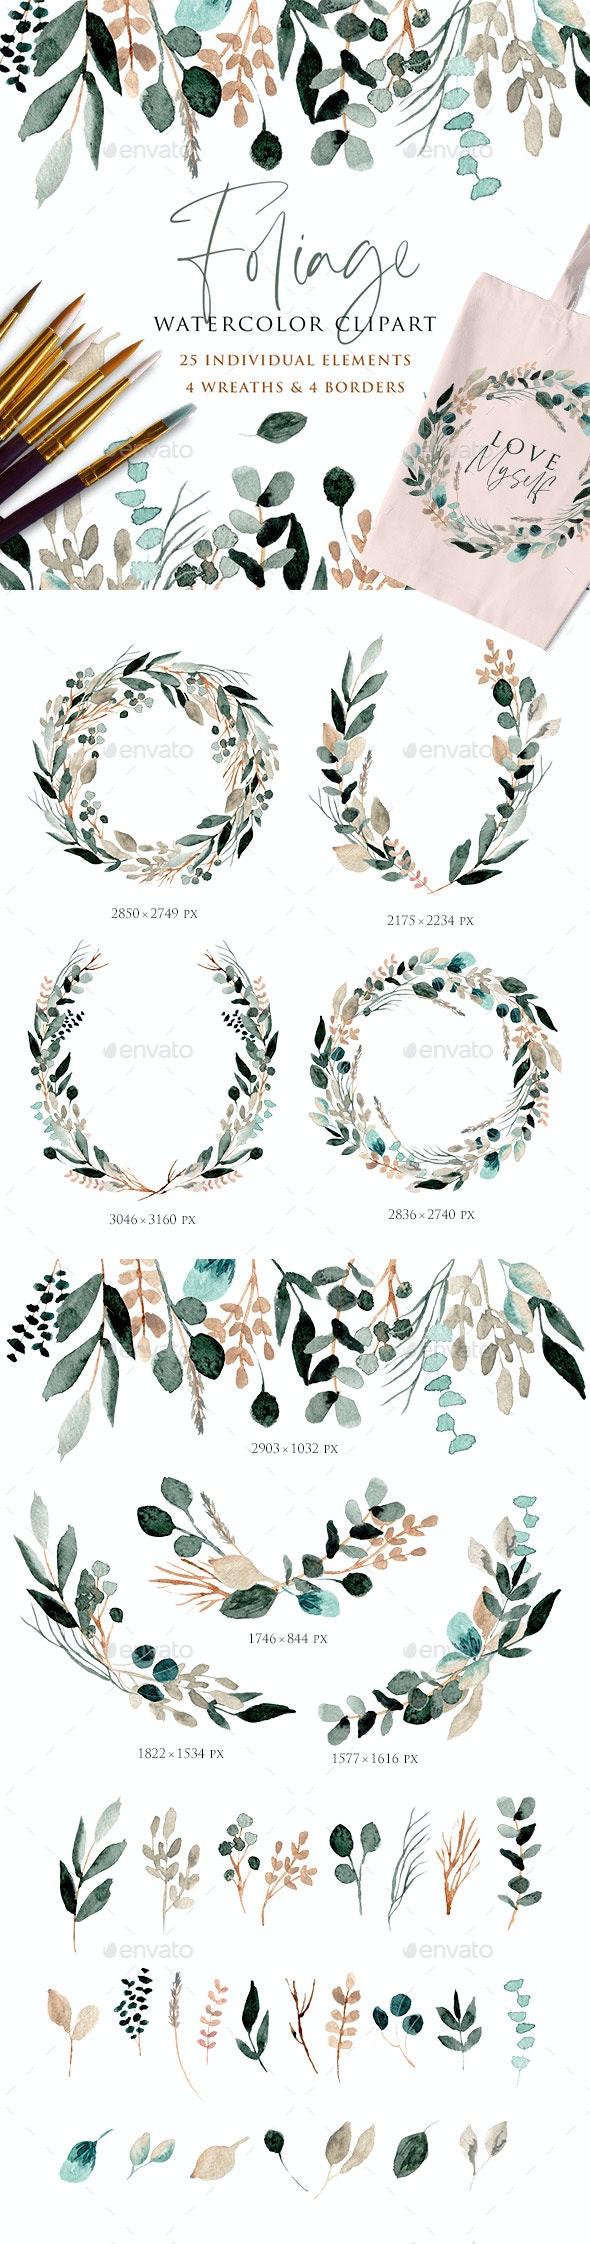 Foliage Watercolor Clipart - Illustrations Graphics